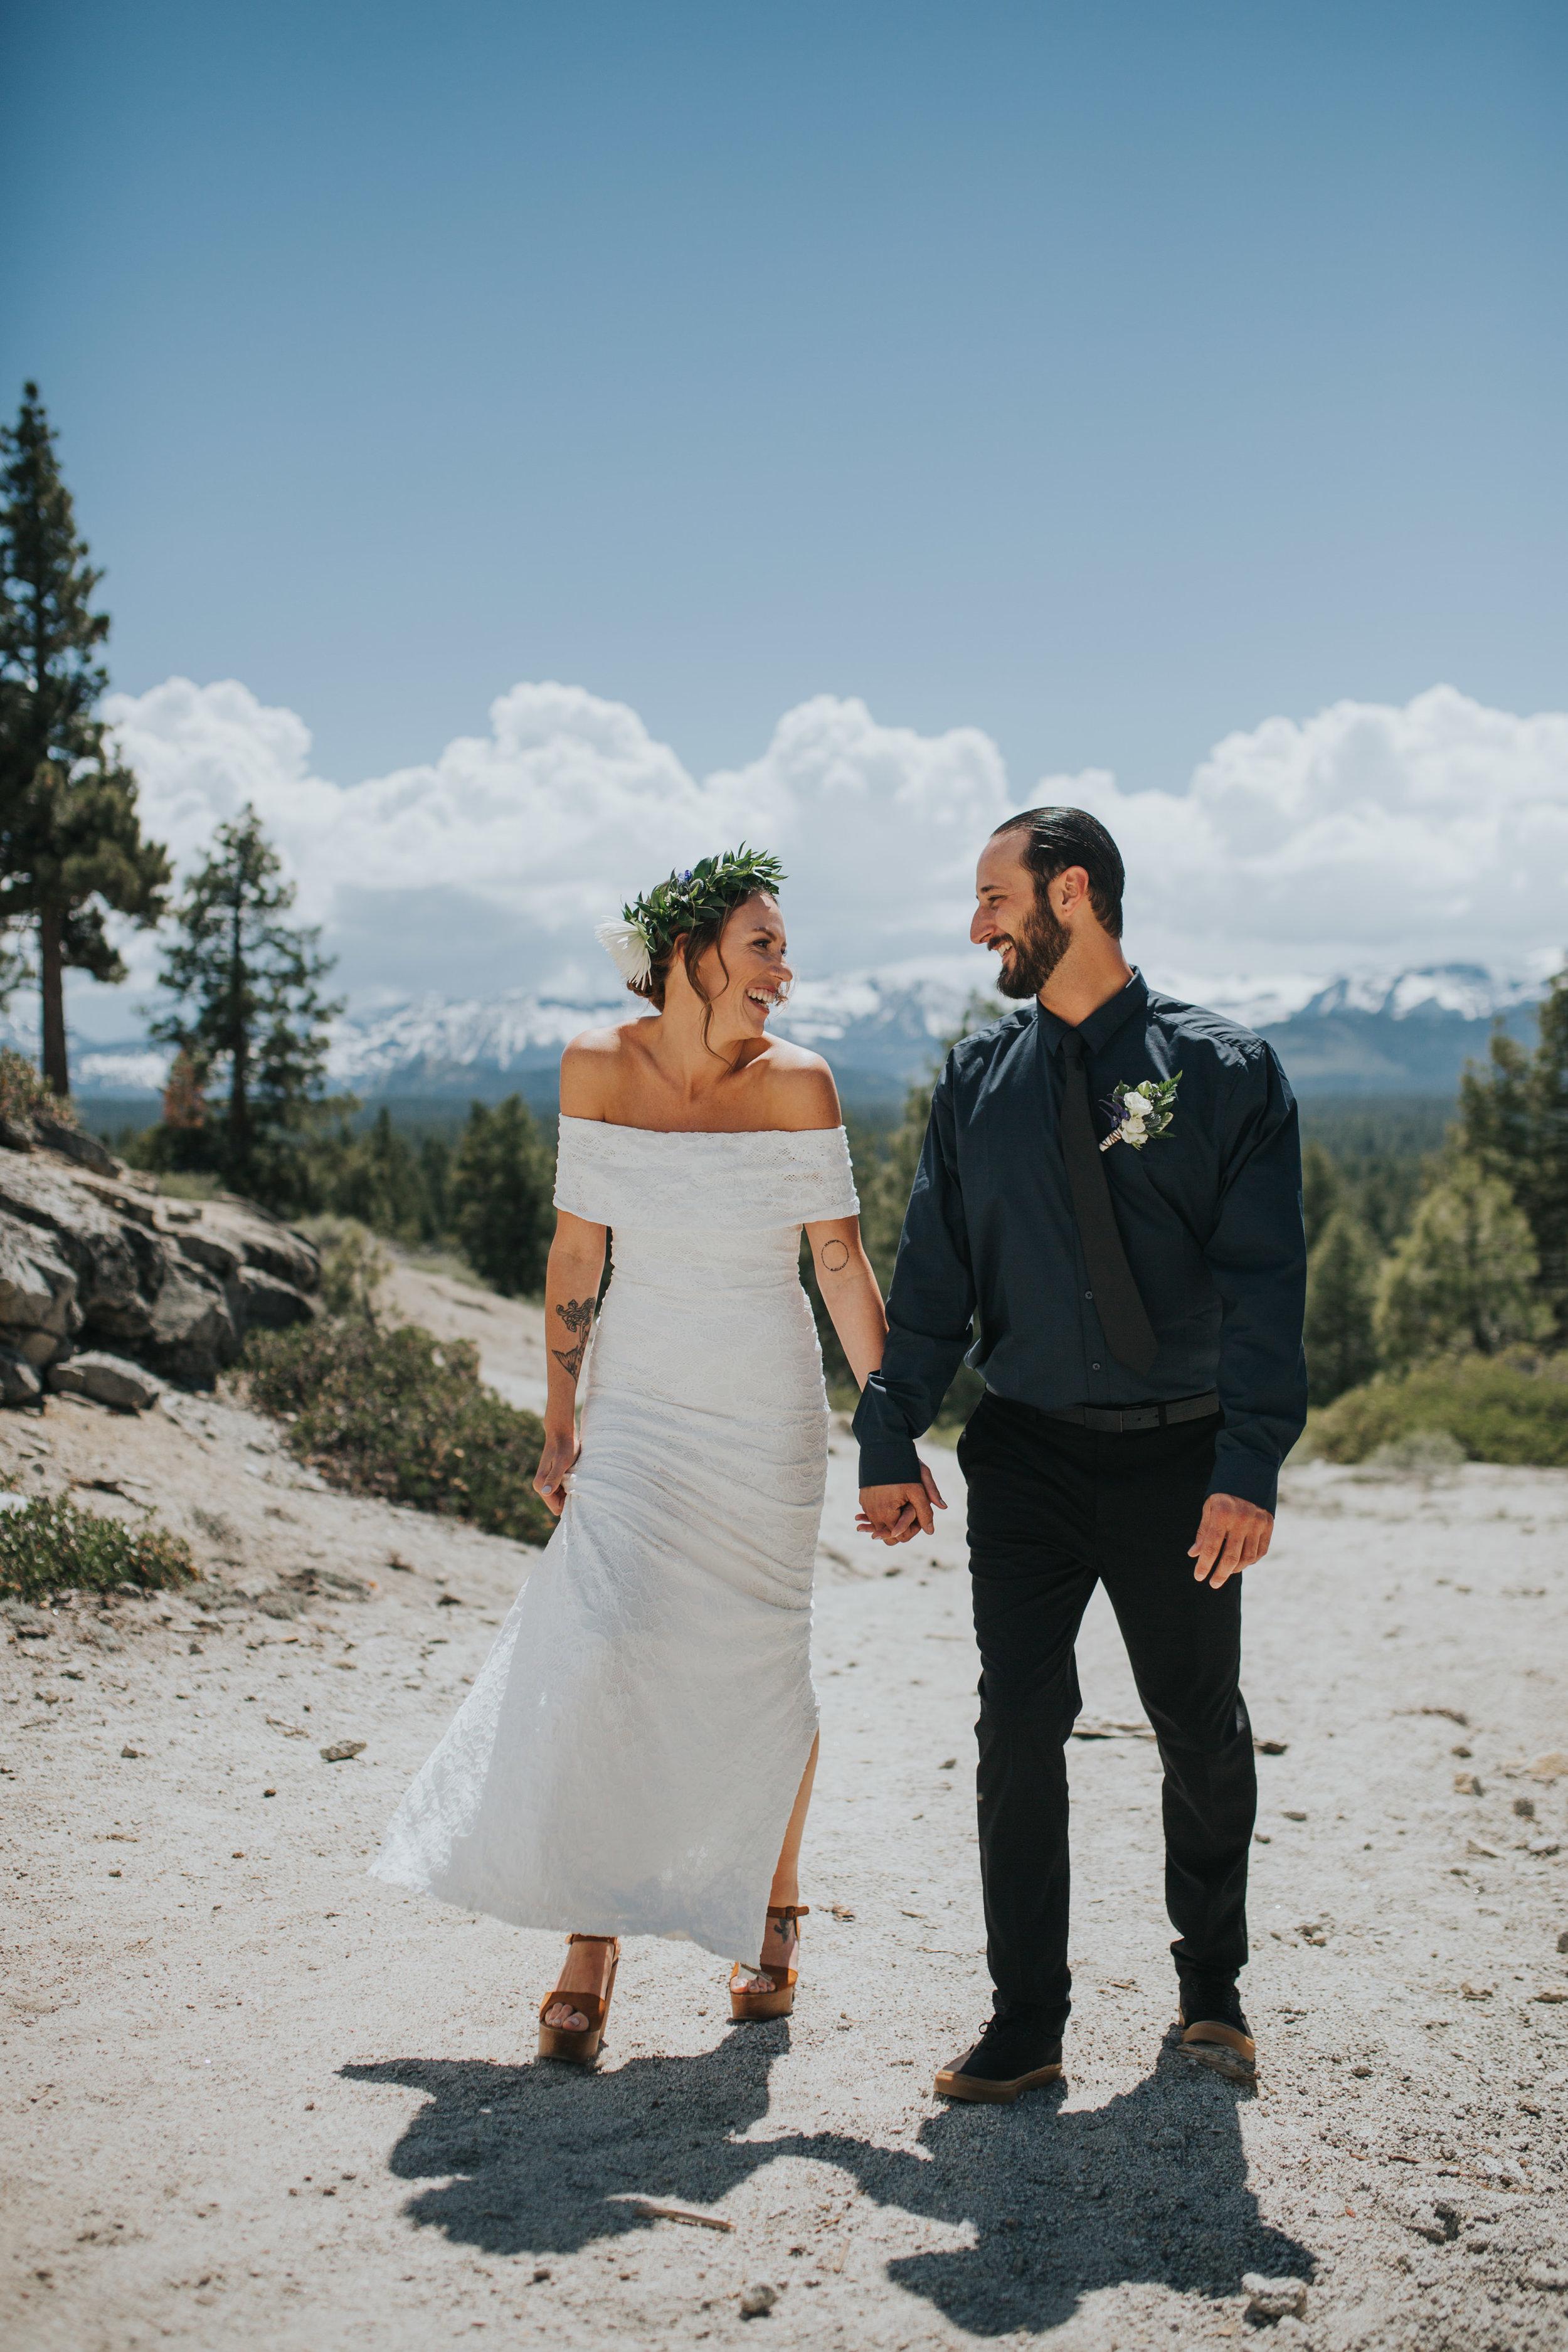 south-lake-tahoe-elopement-valerie-lendvay-photo-023.jpg